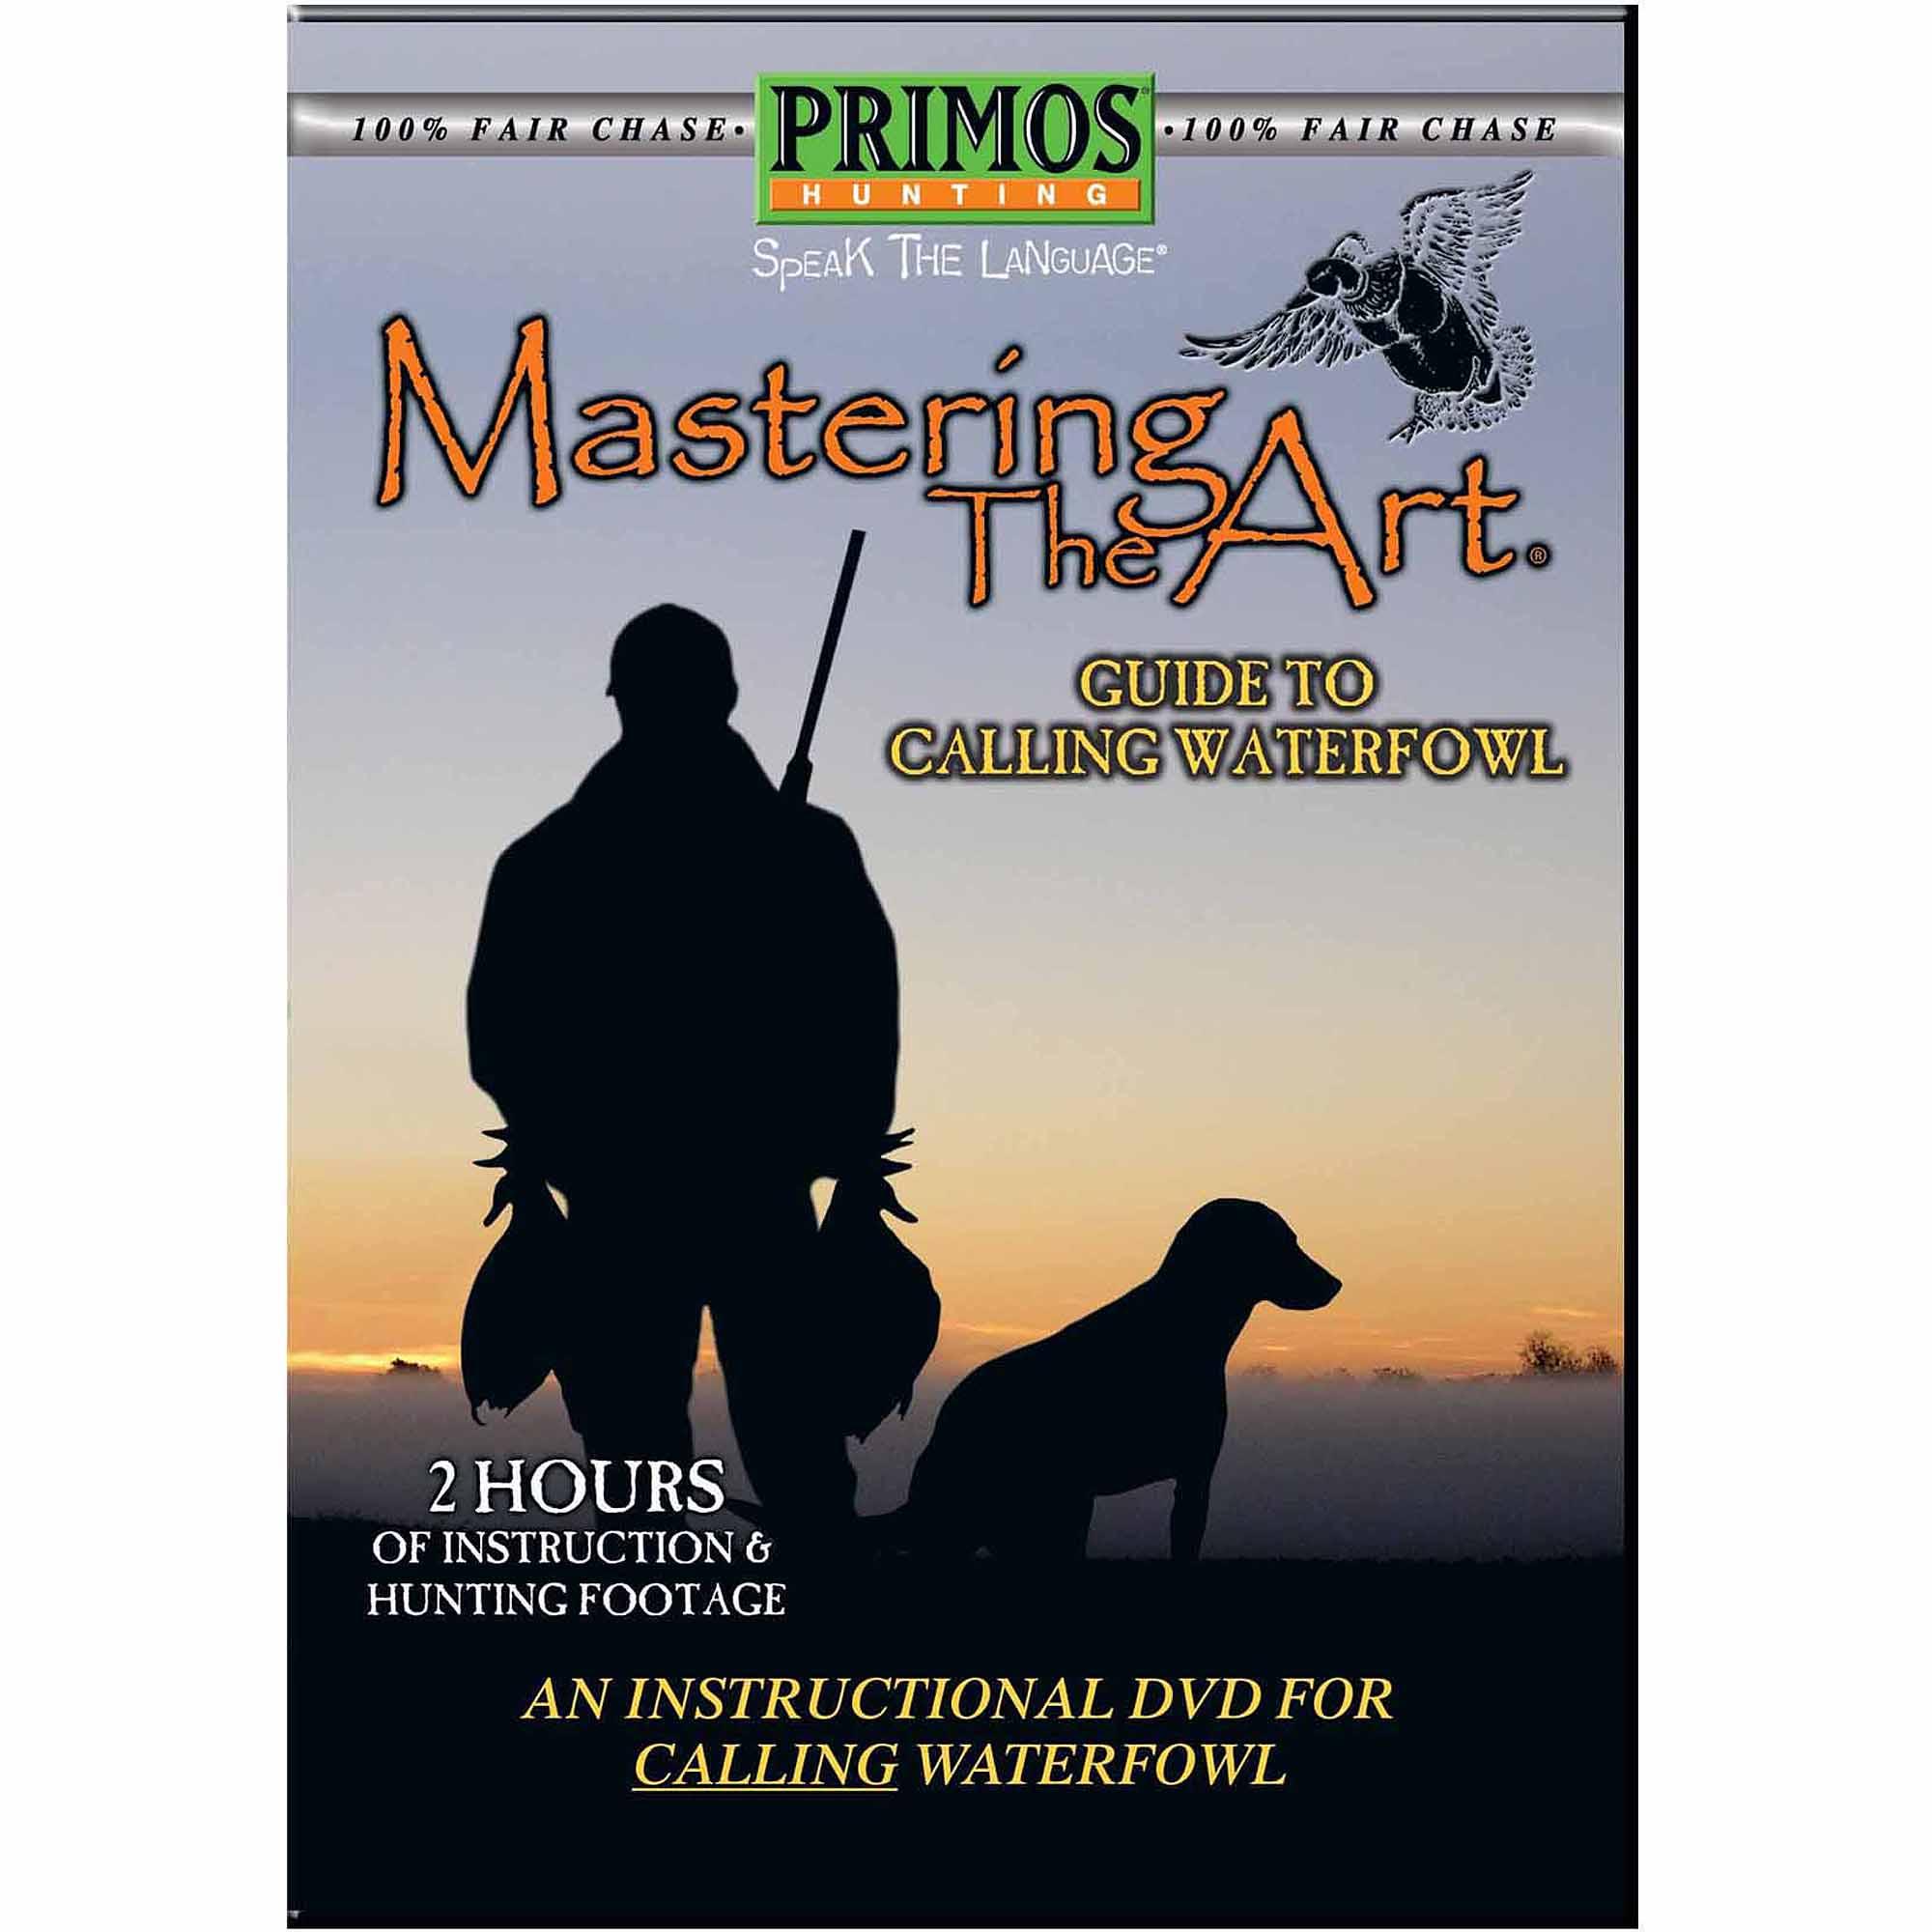 Primos Mastering the Art DVD, Waterfowl by Primos